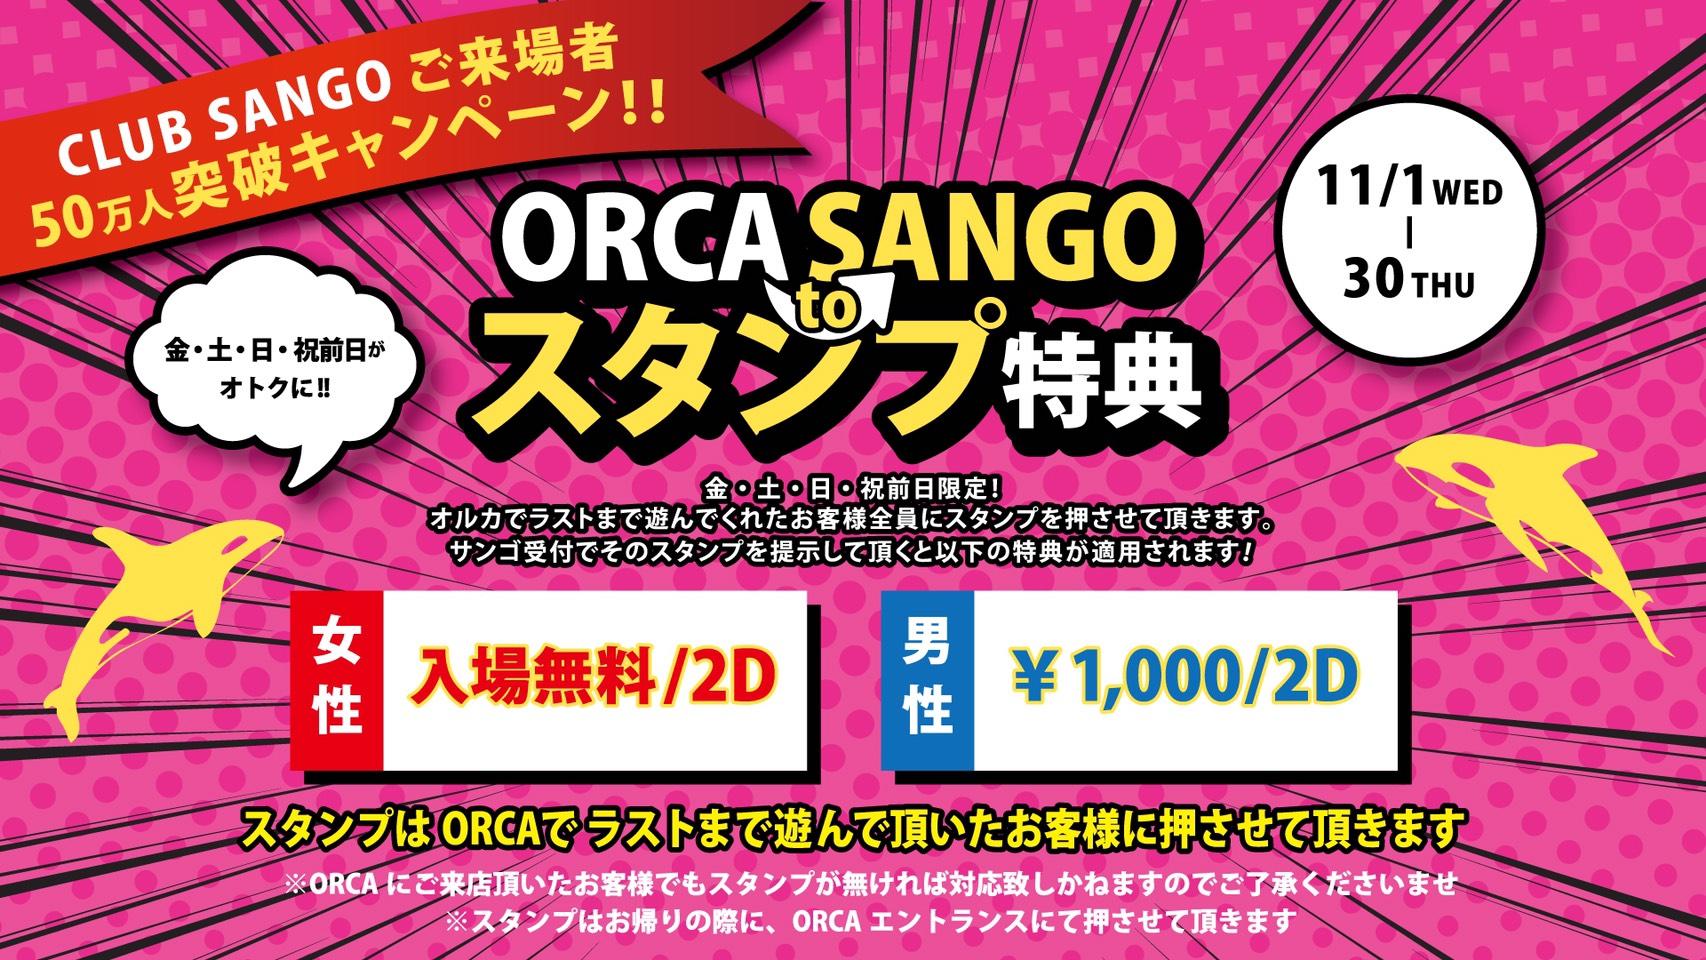 ORCA to SANGO スタンプ特典 / ご来場者50万人突破キャンペーン